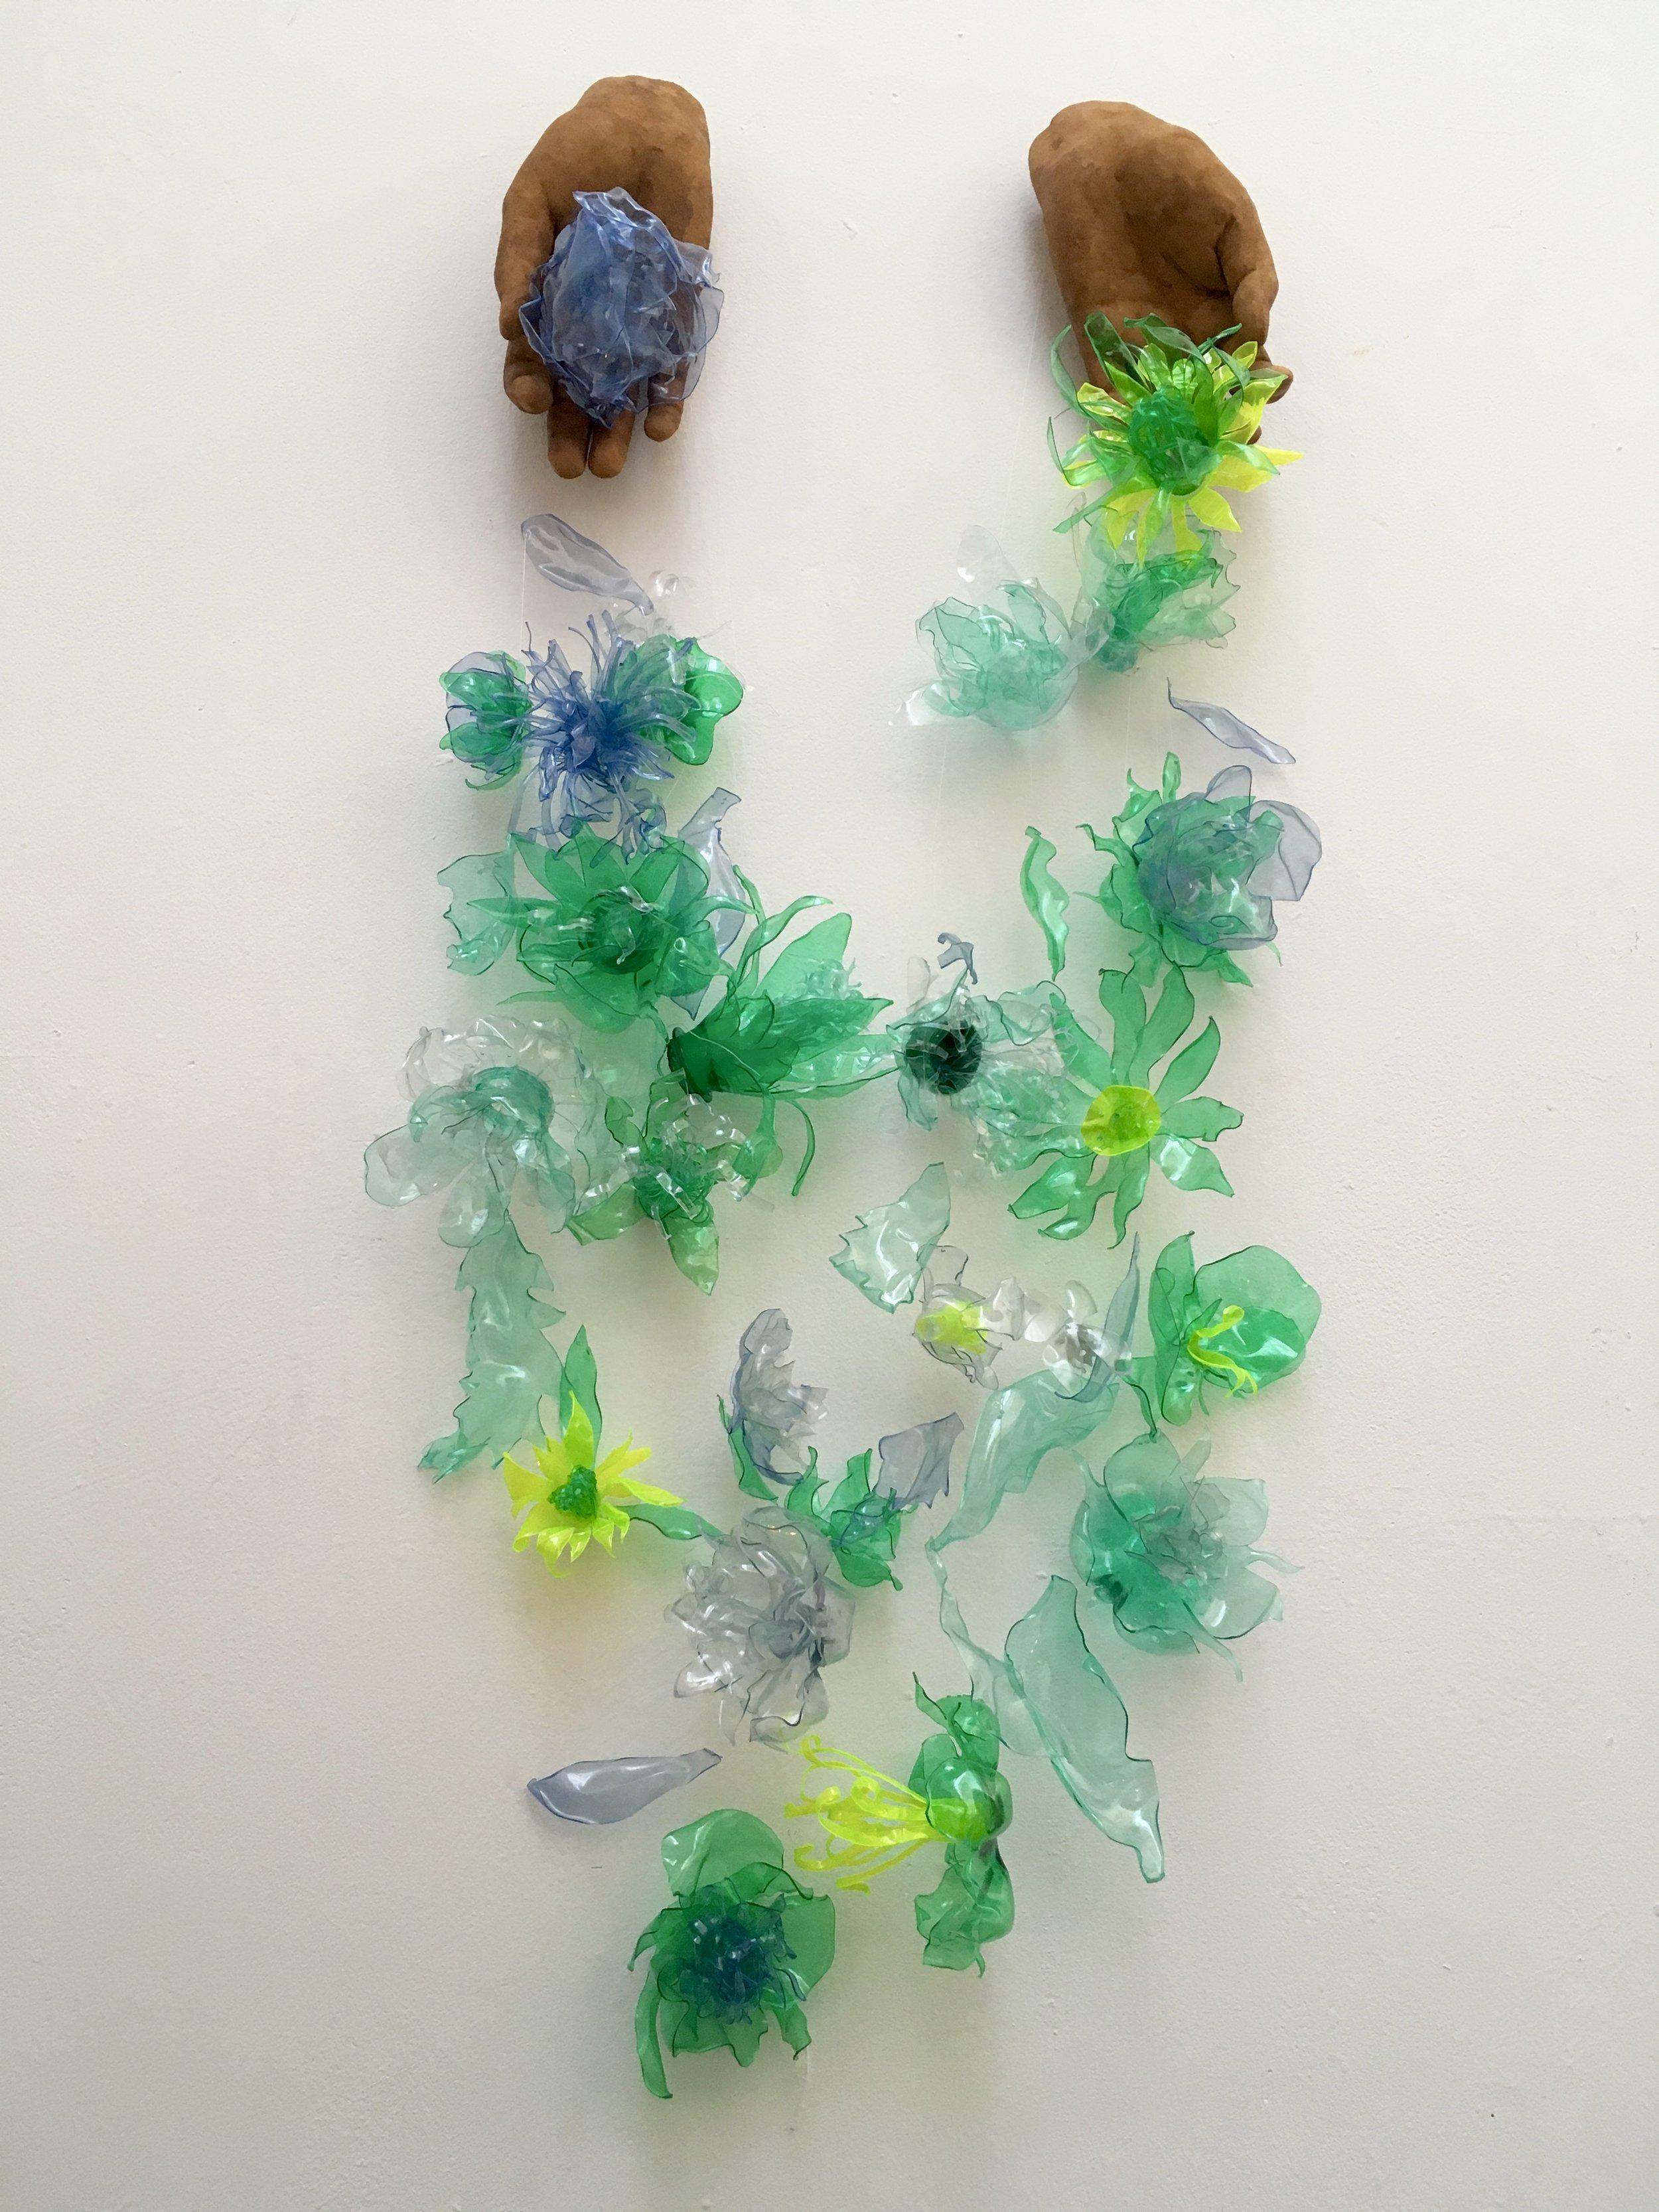 Detritus  (Recycled bottles, bio resin, fishing line) 25cm by 80cm